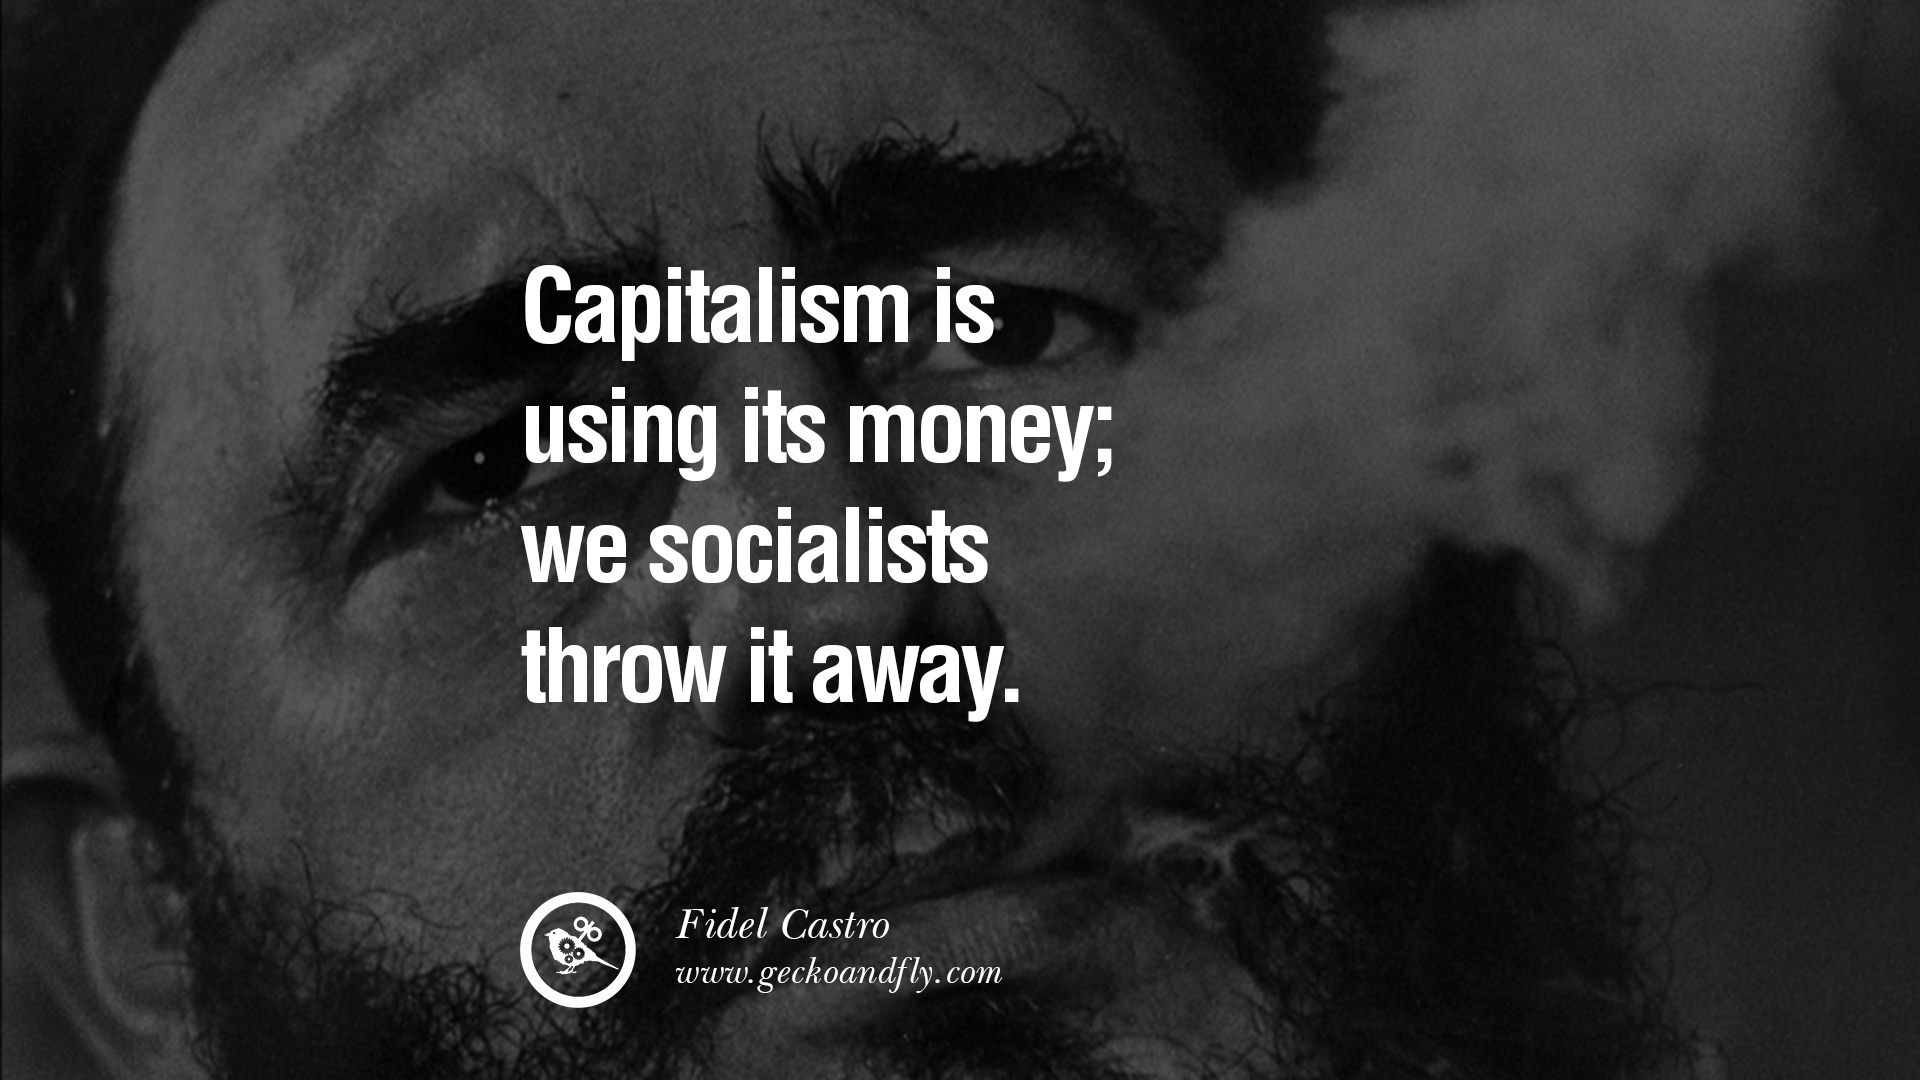 Quotes About Revolution Quotesgram: Cuban Revolution Quotes. QuotesGram